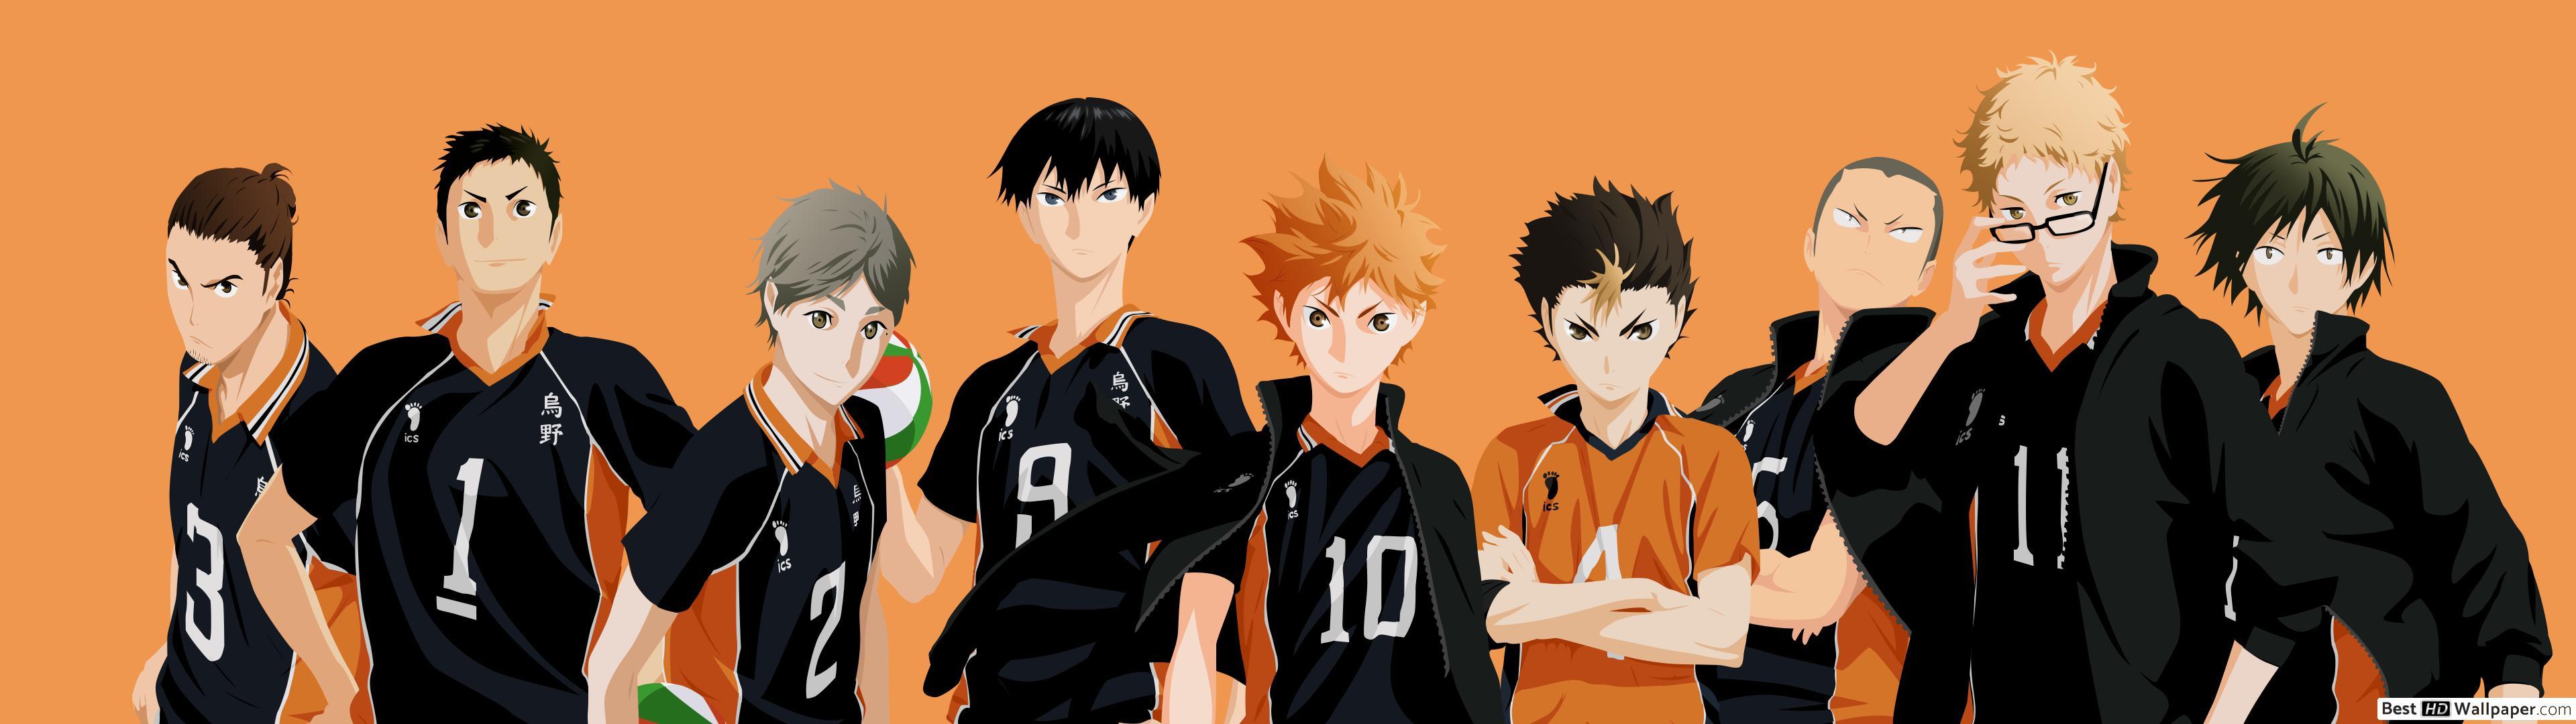 Wallpaper Haikyuu Karasuno   Anime Wallpaper HD 3840x1080